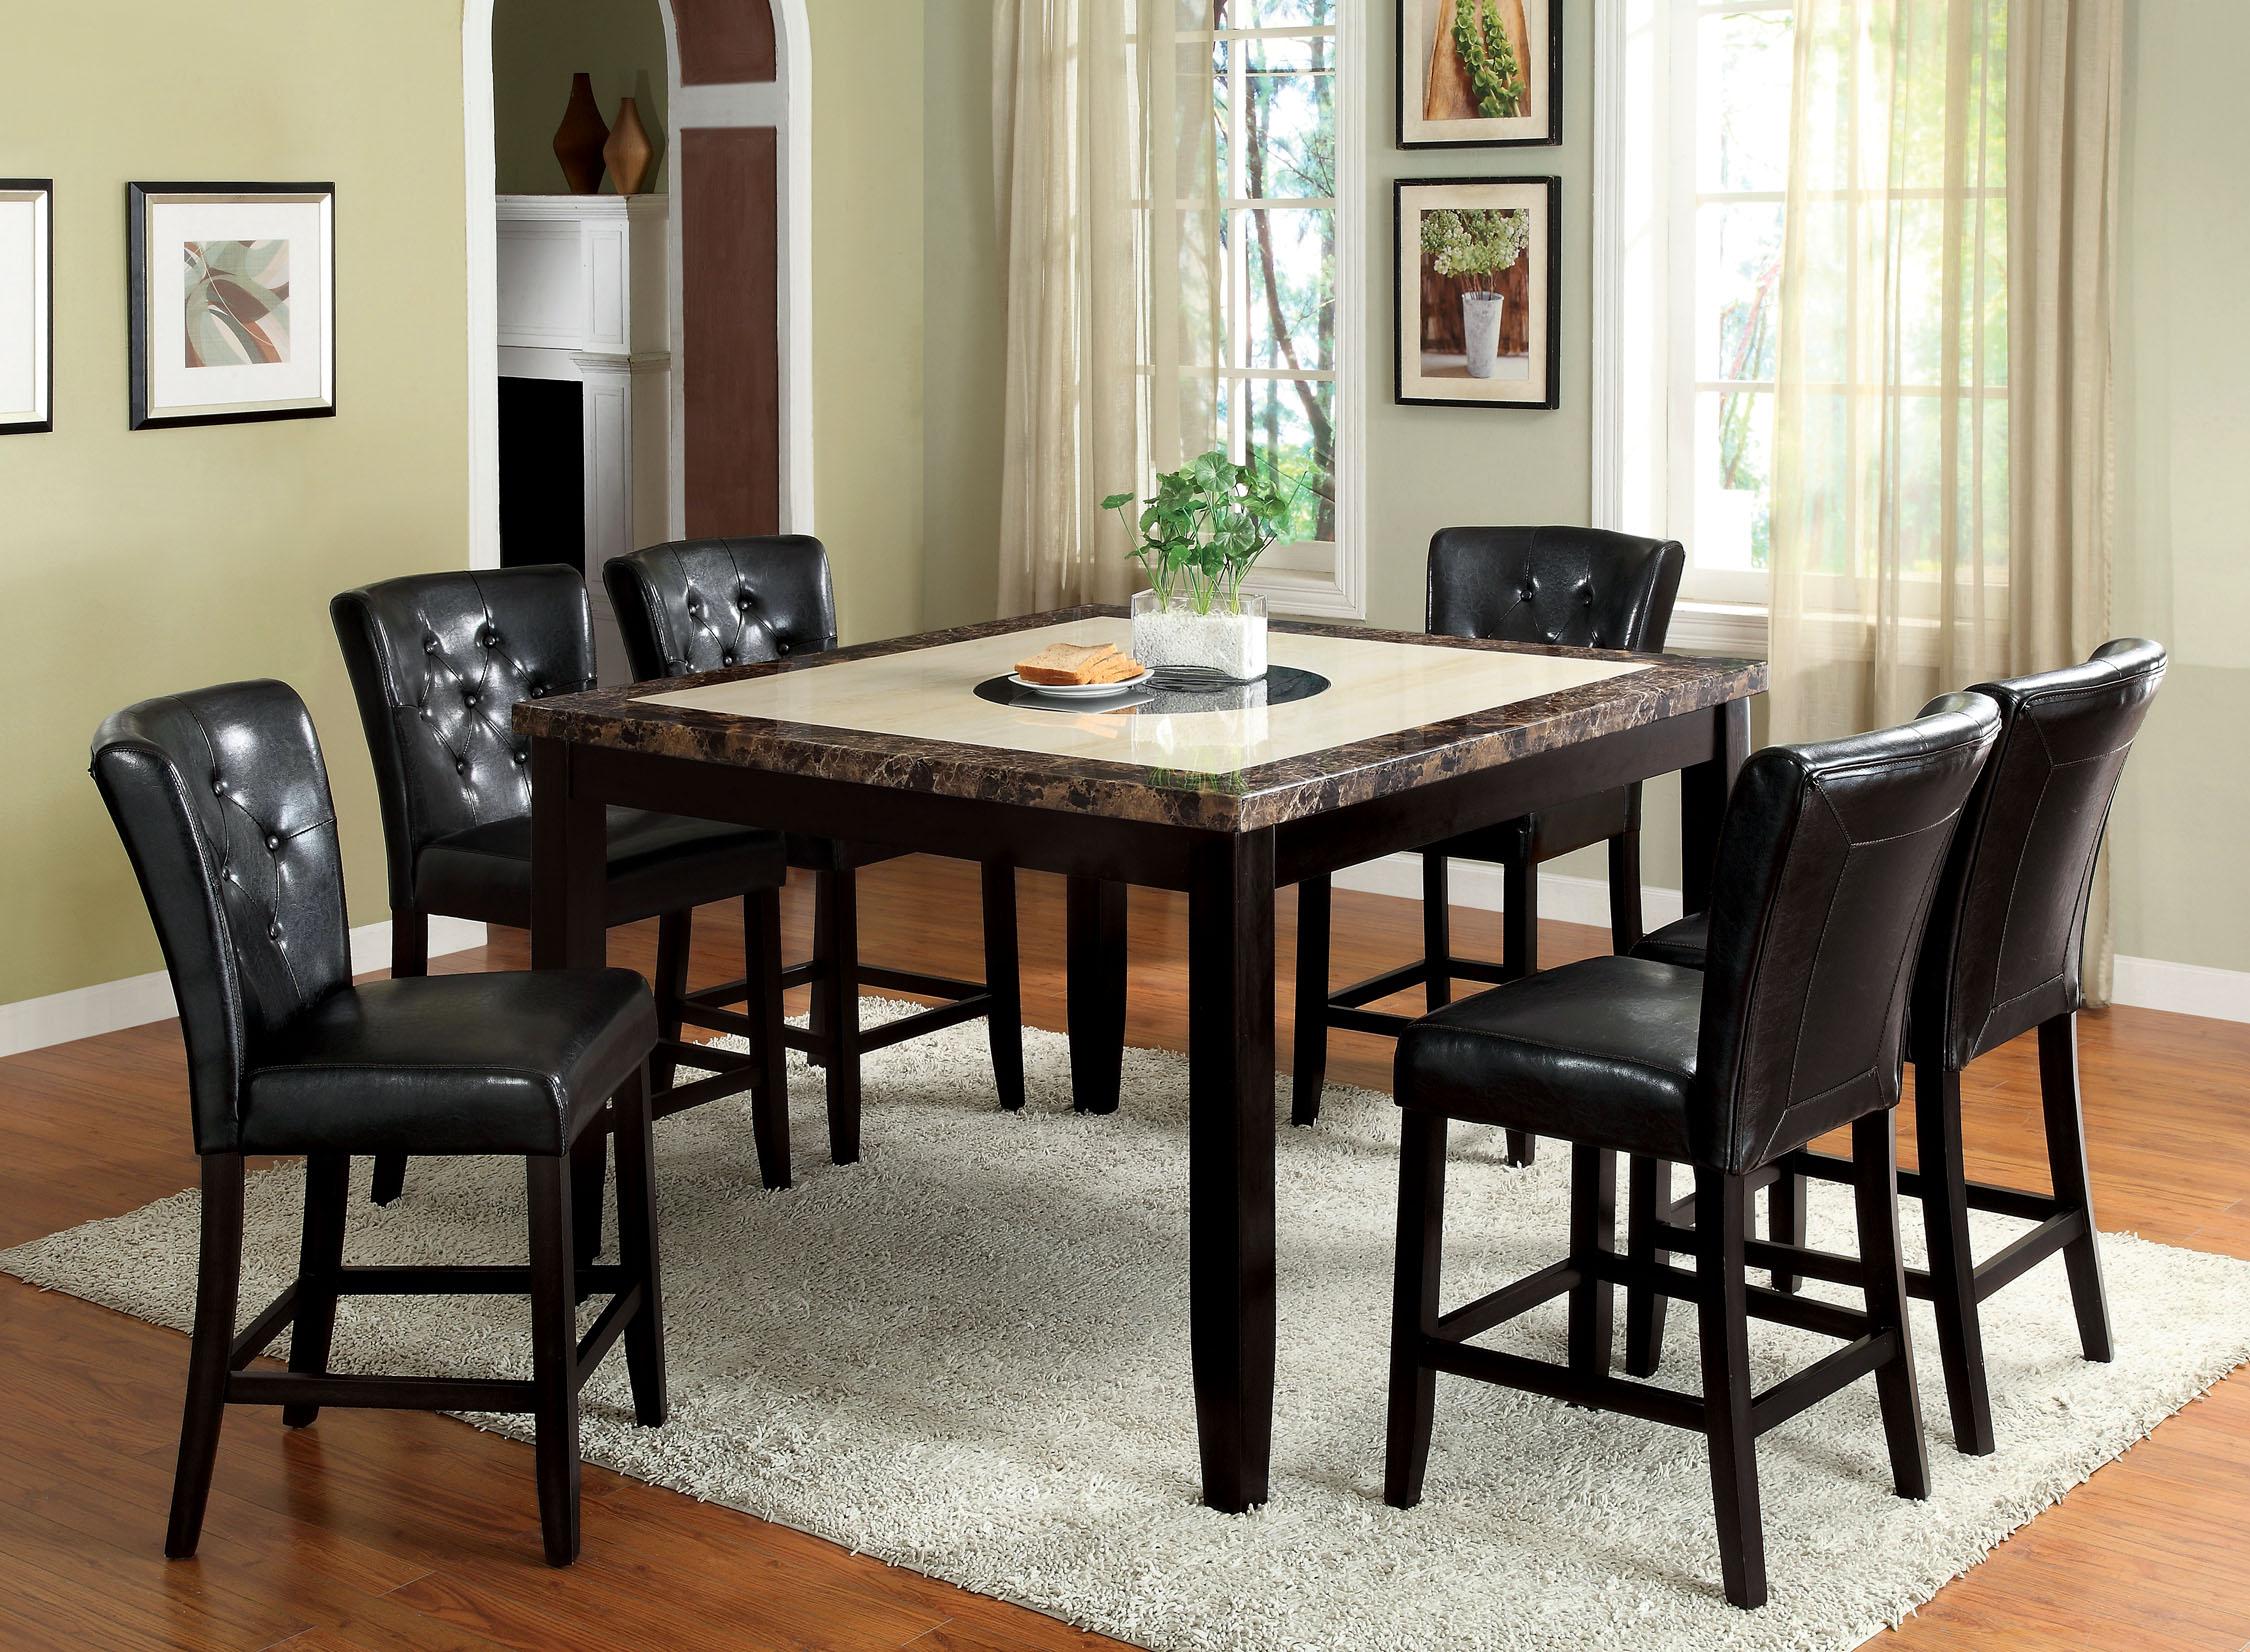 Furniture of America Black Edman 7 Piece Counter Height Set PartNumber: 00861596000P KsnValue: 8125782 MfgPartNumber: SJEG-5093QU-9QD